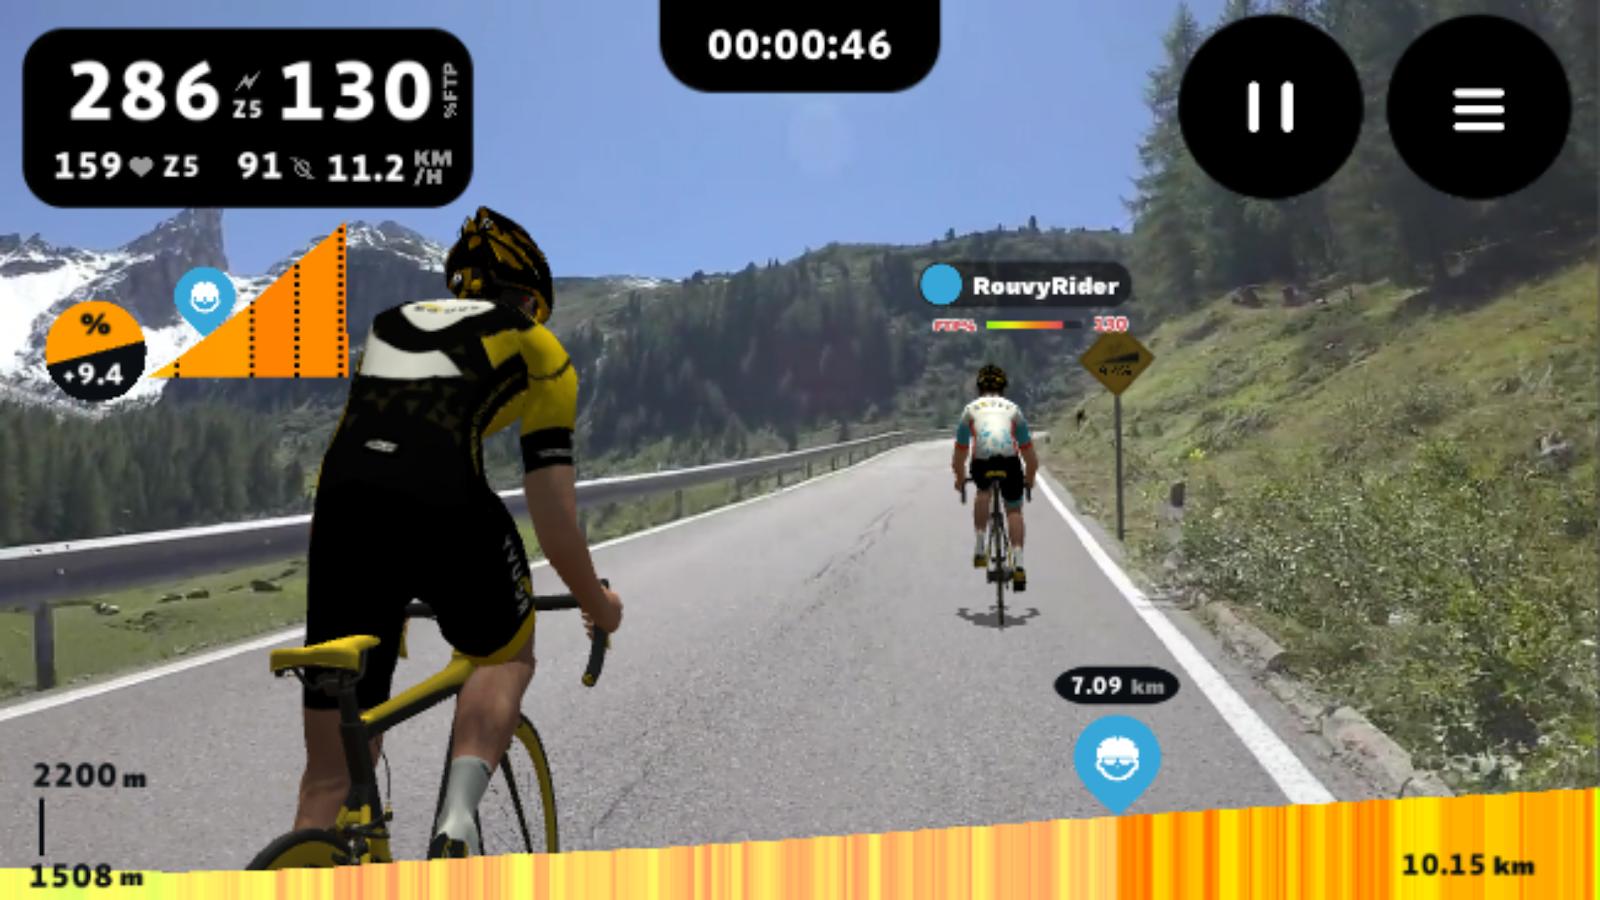 eu virtualtraining 4 2 4 APK Download - Android Sports Games